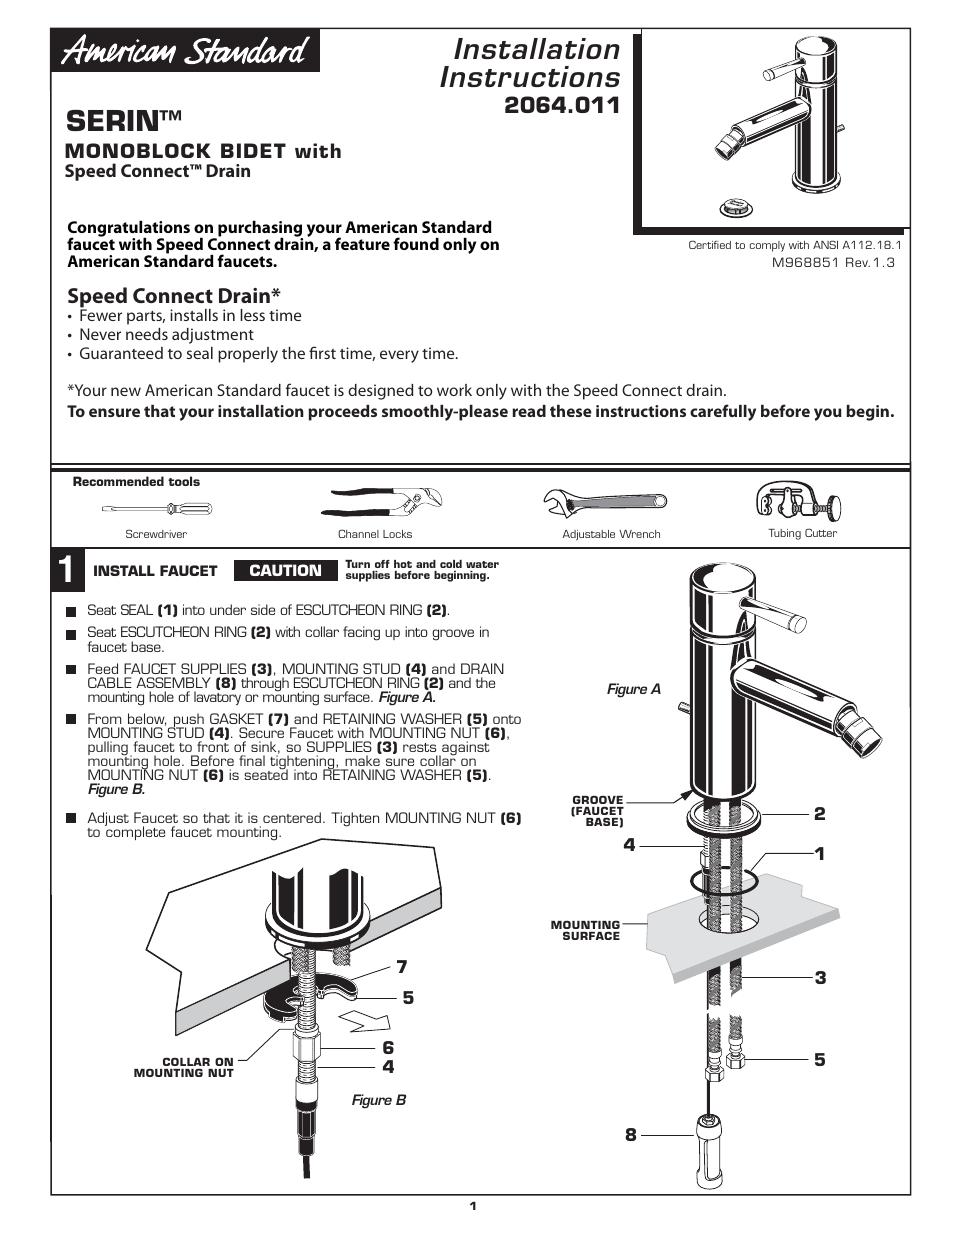 American Standard MONOBLOCK BIDET 2064.011 User Manual | 6 pages